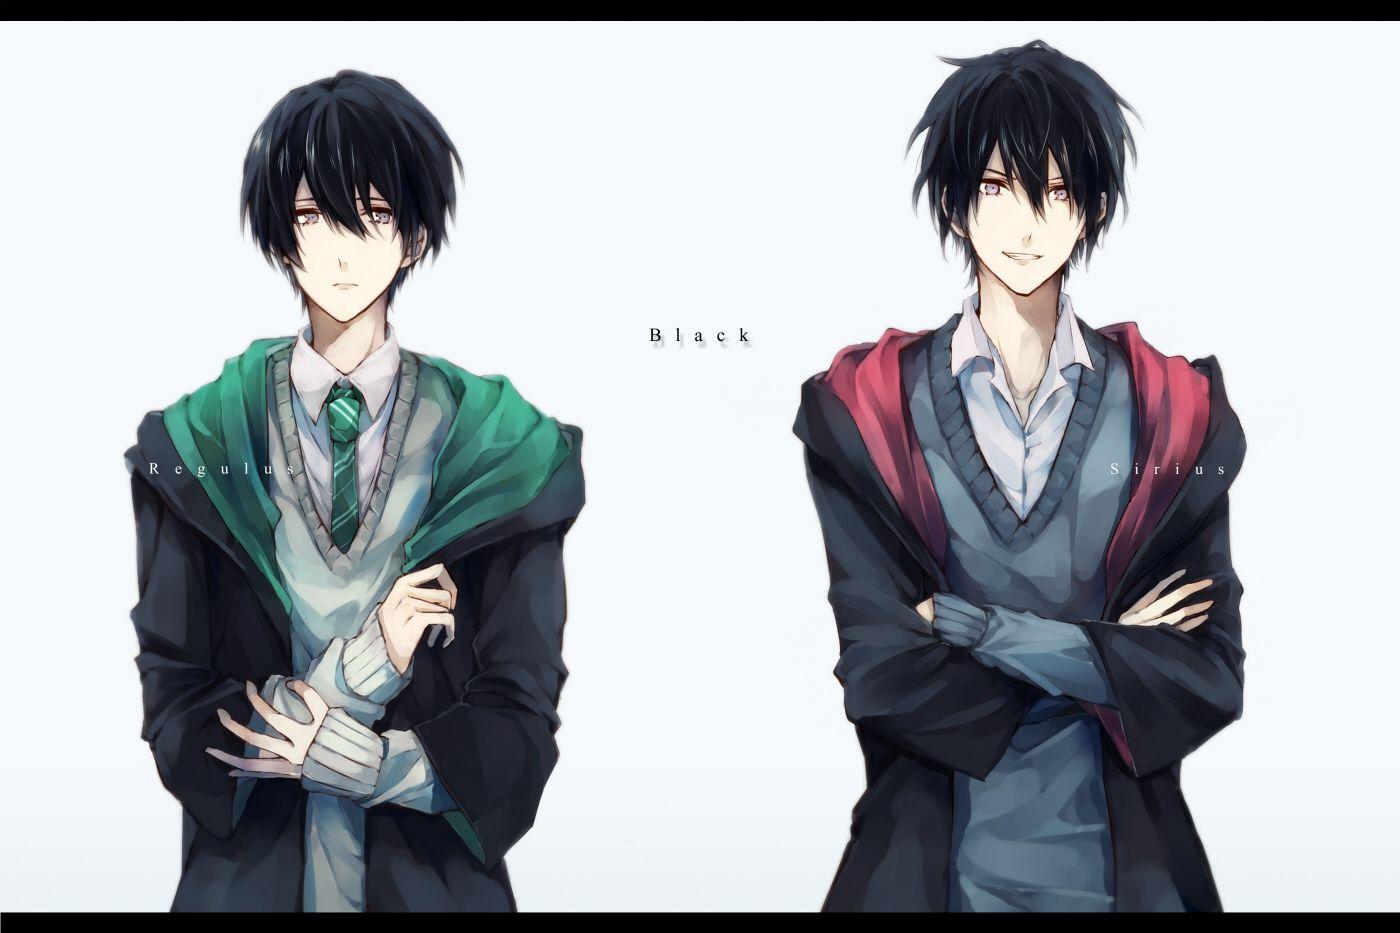 Tags: Fanart, Harry Potter, Sirius Black, Regulus Black